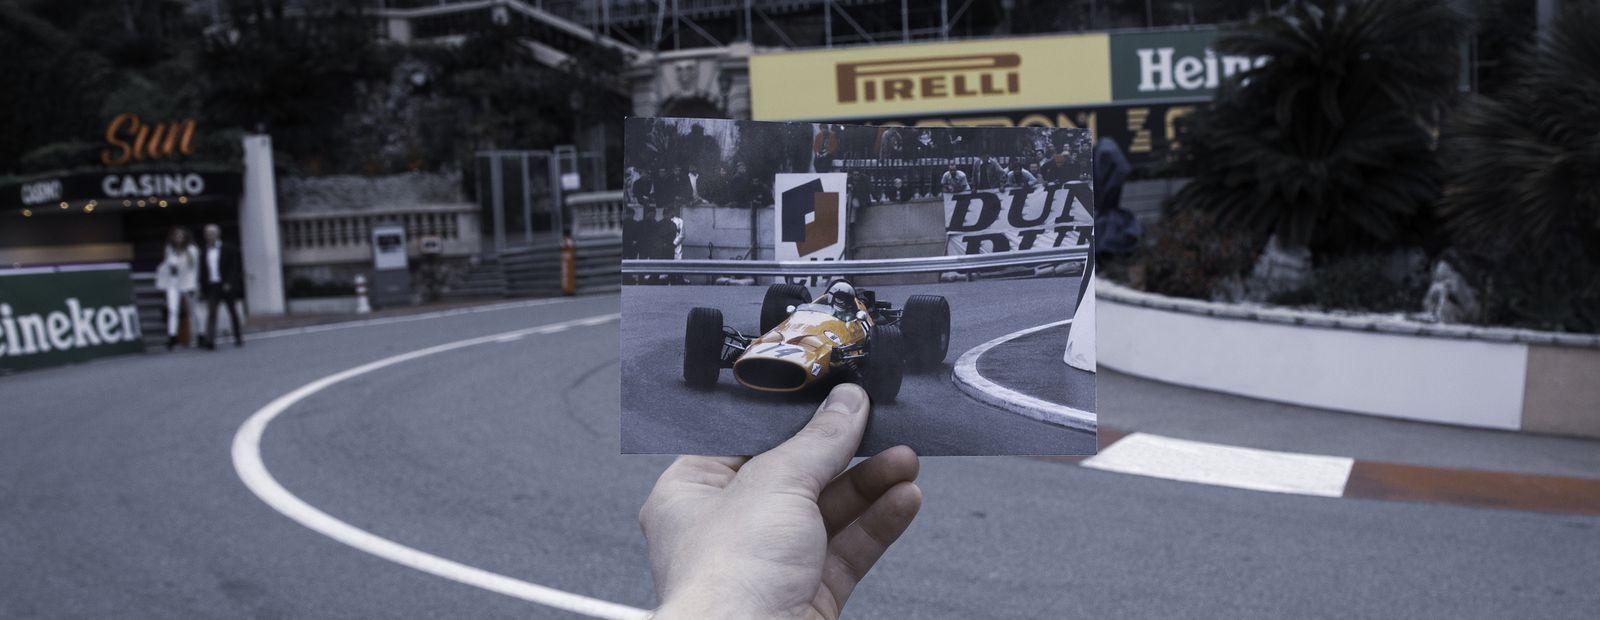 Monaco Memories